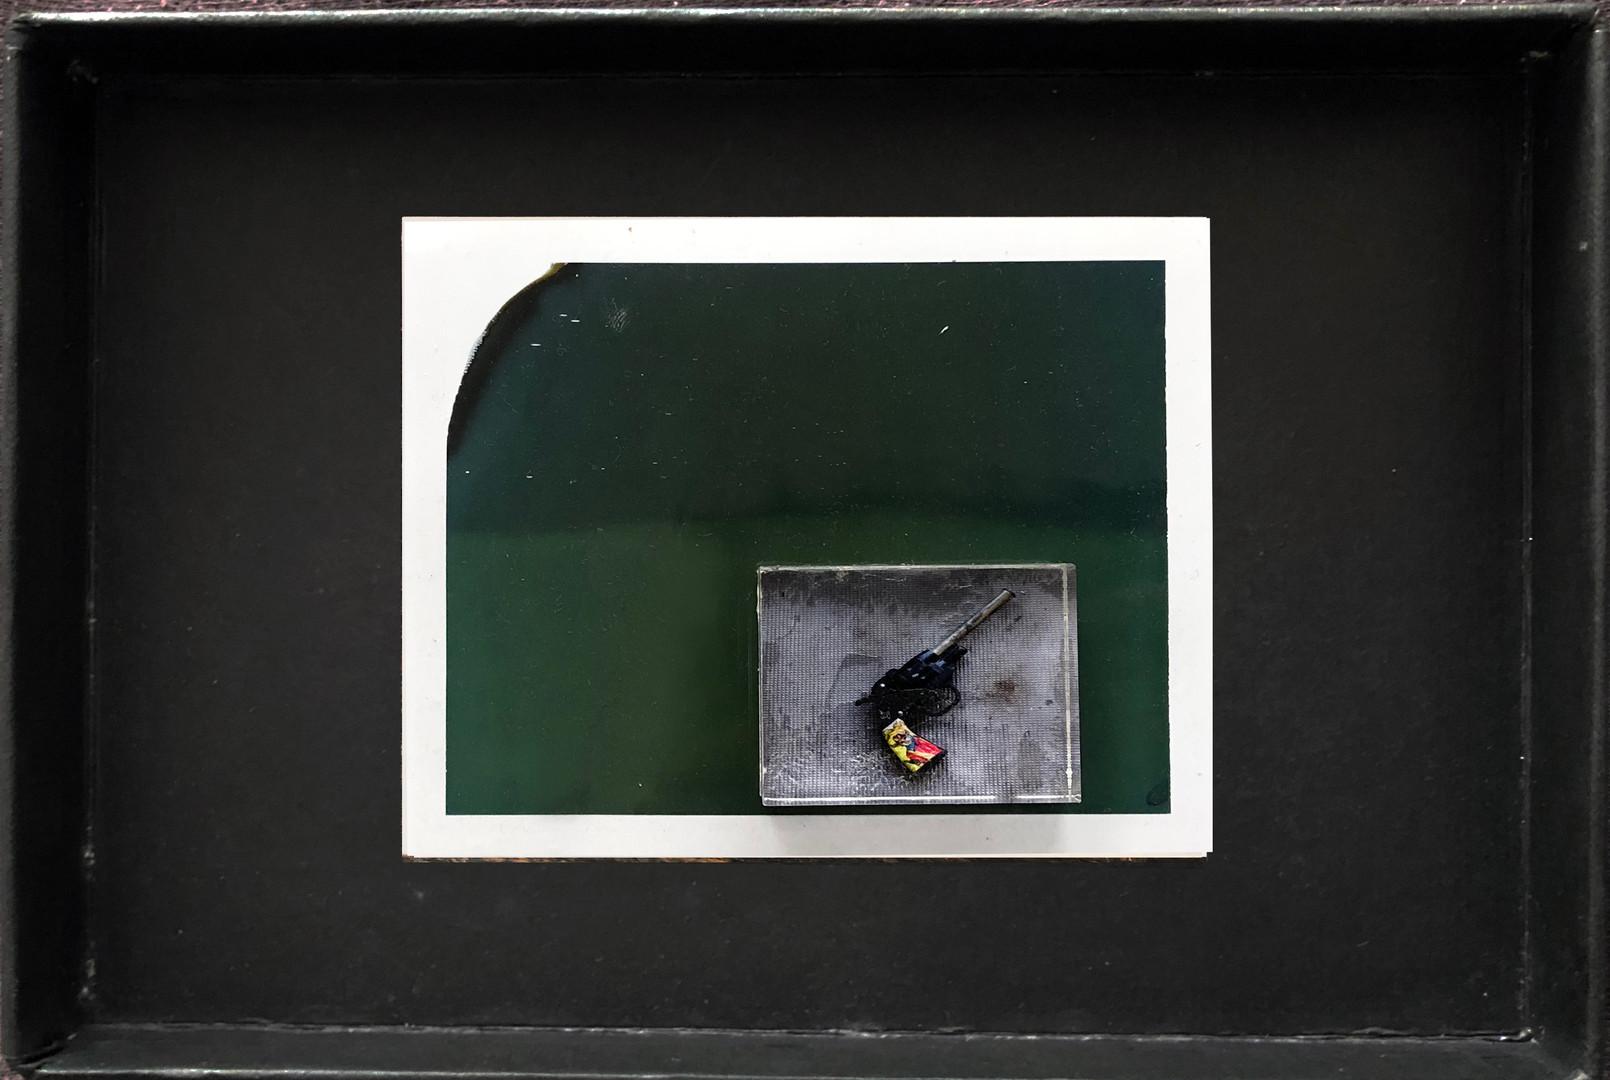 "Series X-Pola ""Jason's gun"" 2019 8/10cm mounted Plexiglass on Polaroid Edition 1/1 NIS 1,000 per object"